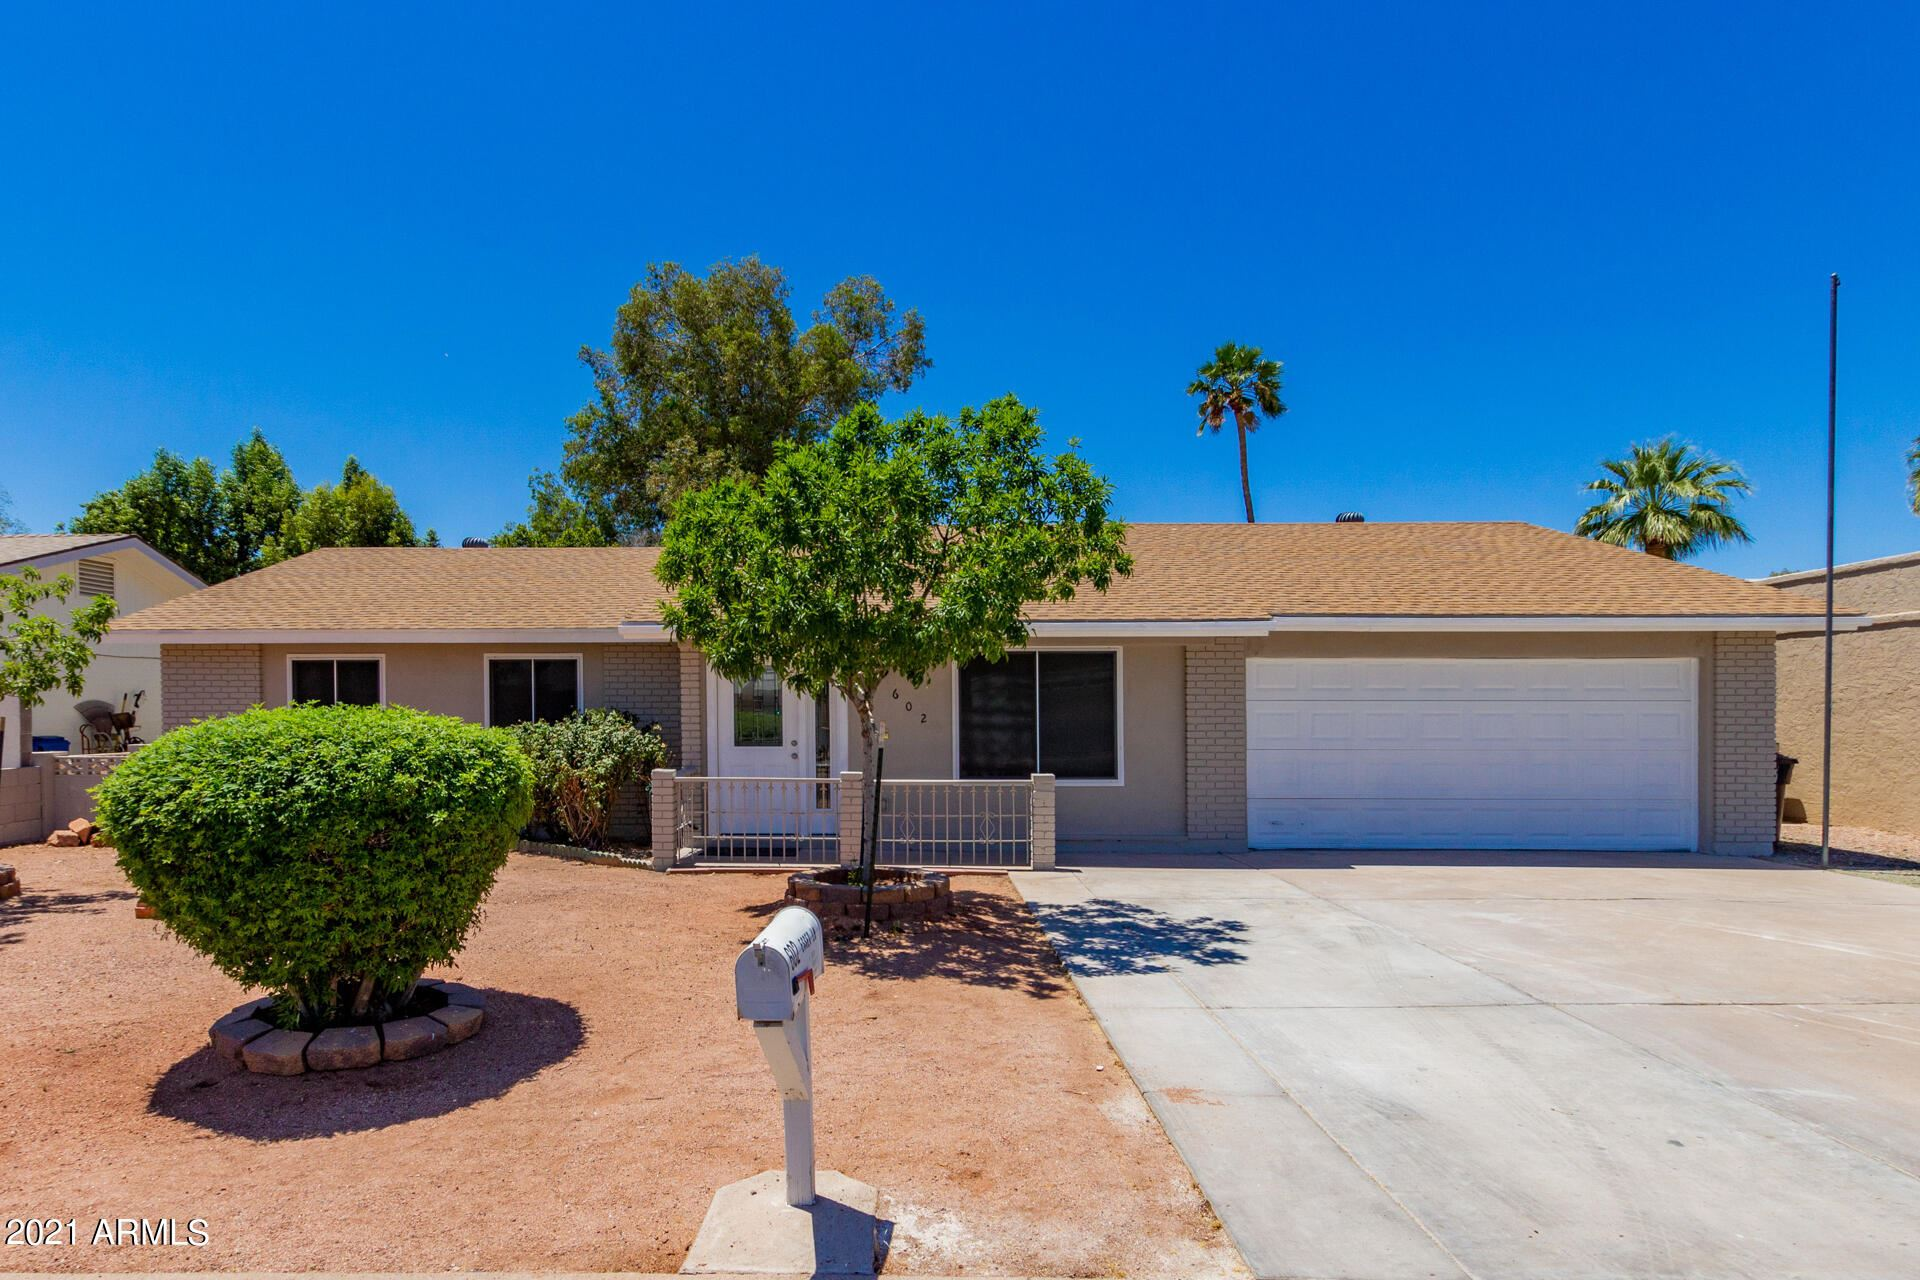 Photo of 602 S ESSEX Lane, Mesa, AZ 85208 (MLS # 6232608)